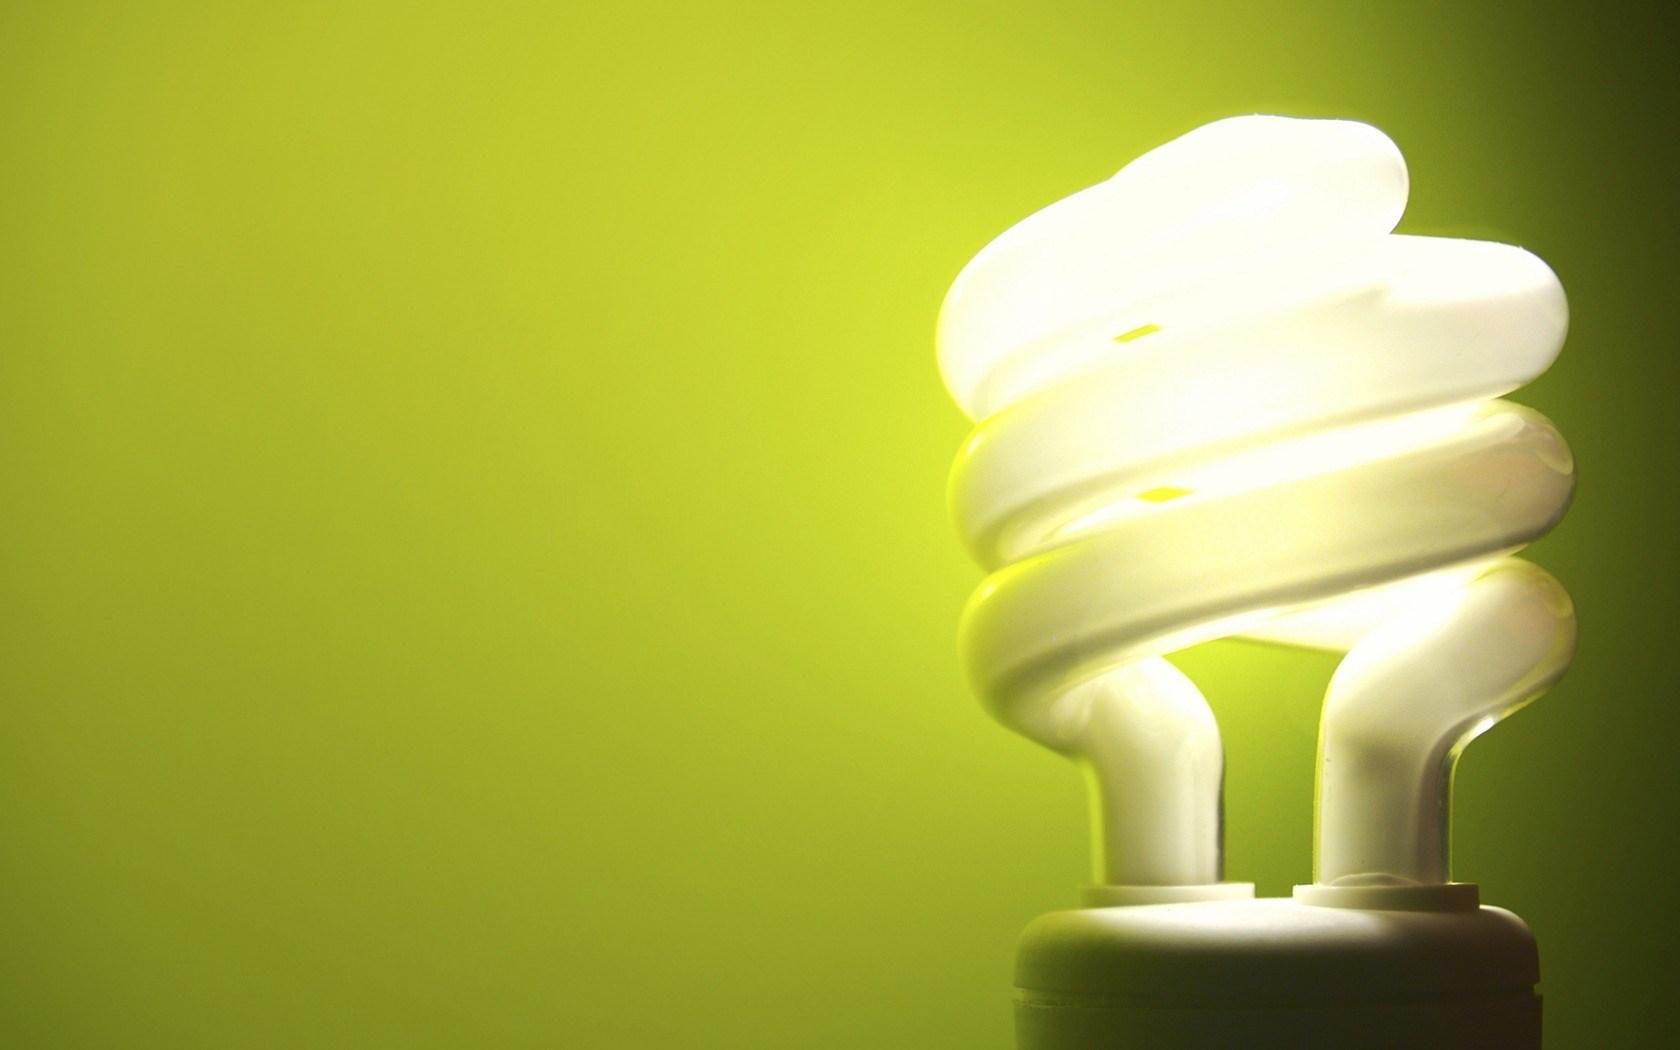 cool lamp 39793